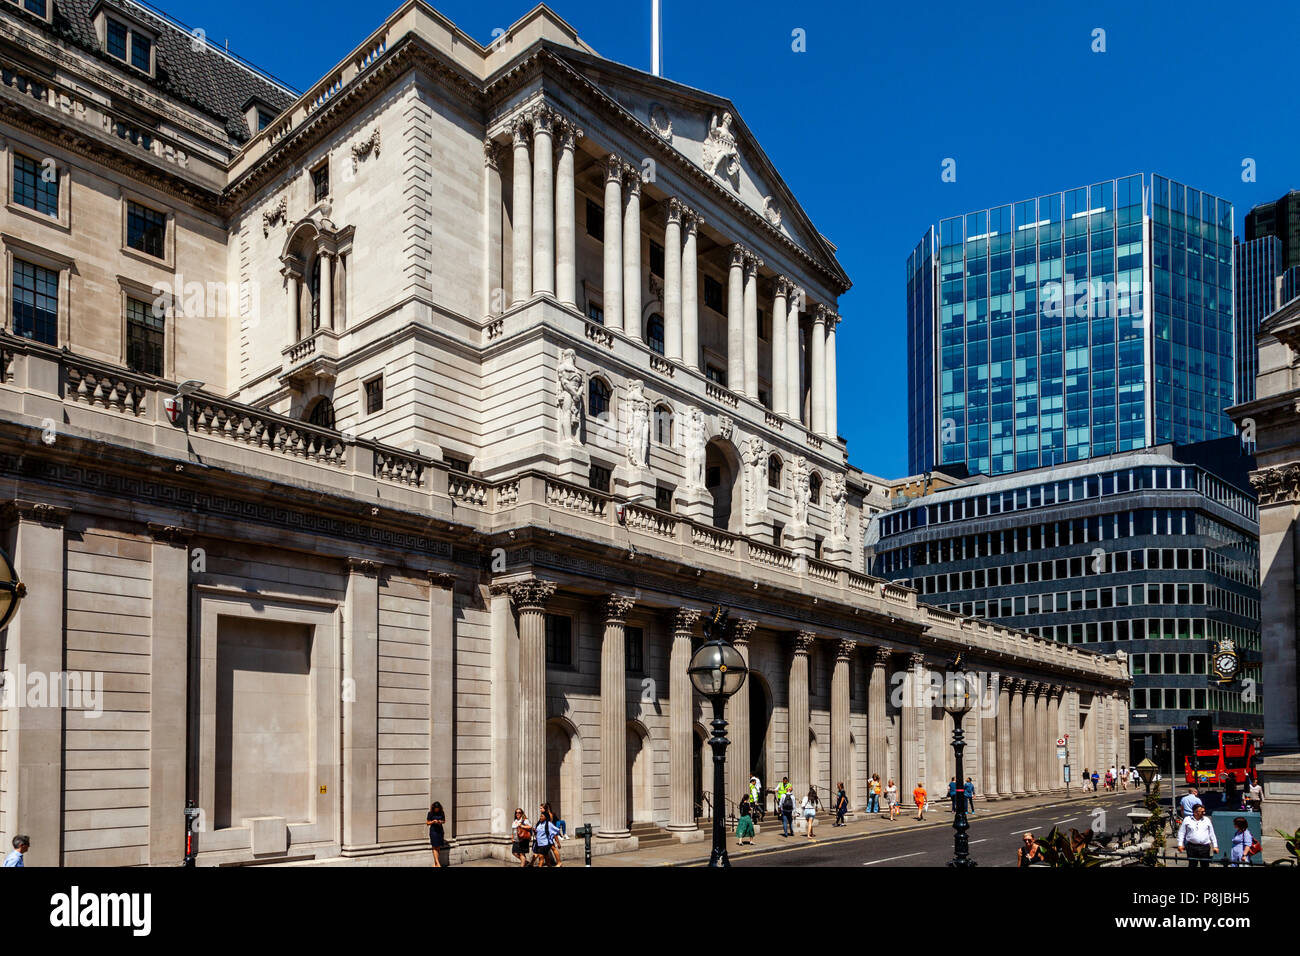 The Bank Of England, Threadneedle Street, The City of London, London, England - Stock Image